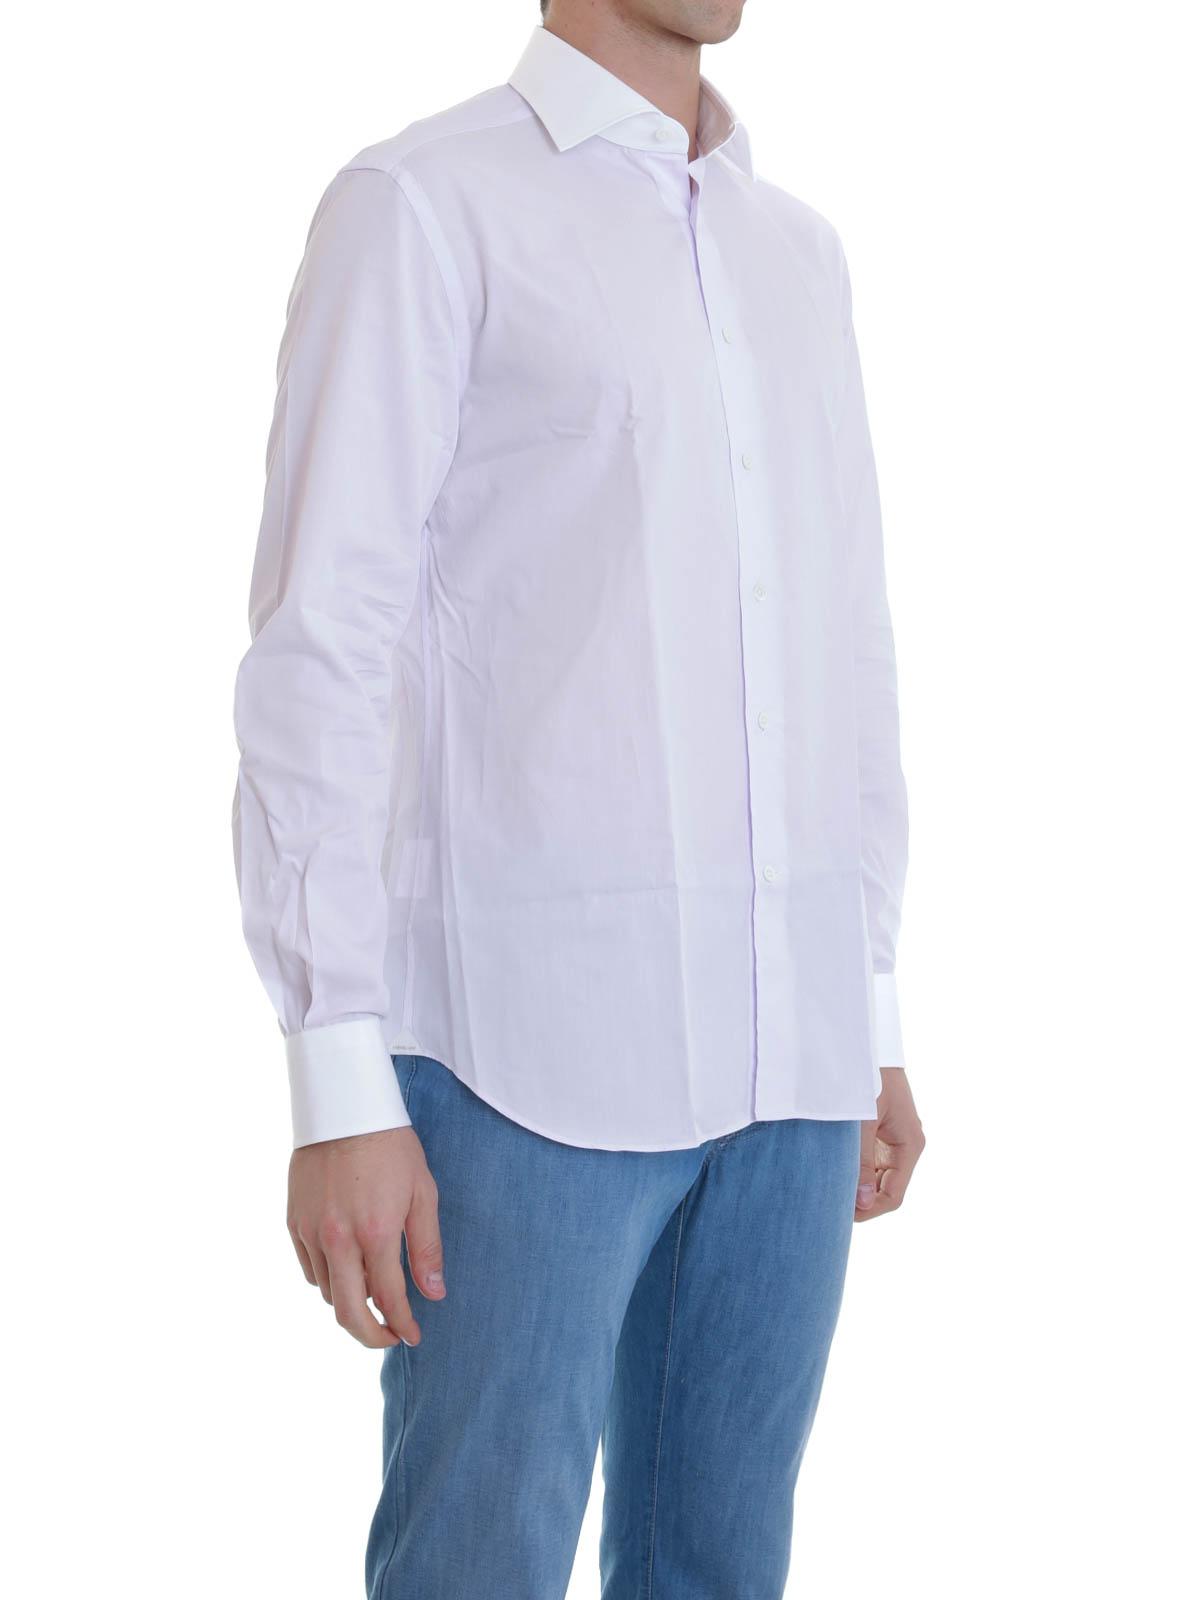 CAMISAS - Camisas Corneliani WKHy9V